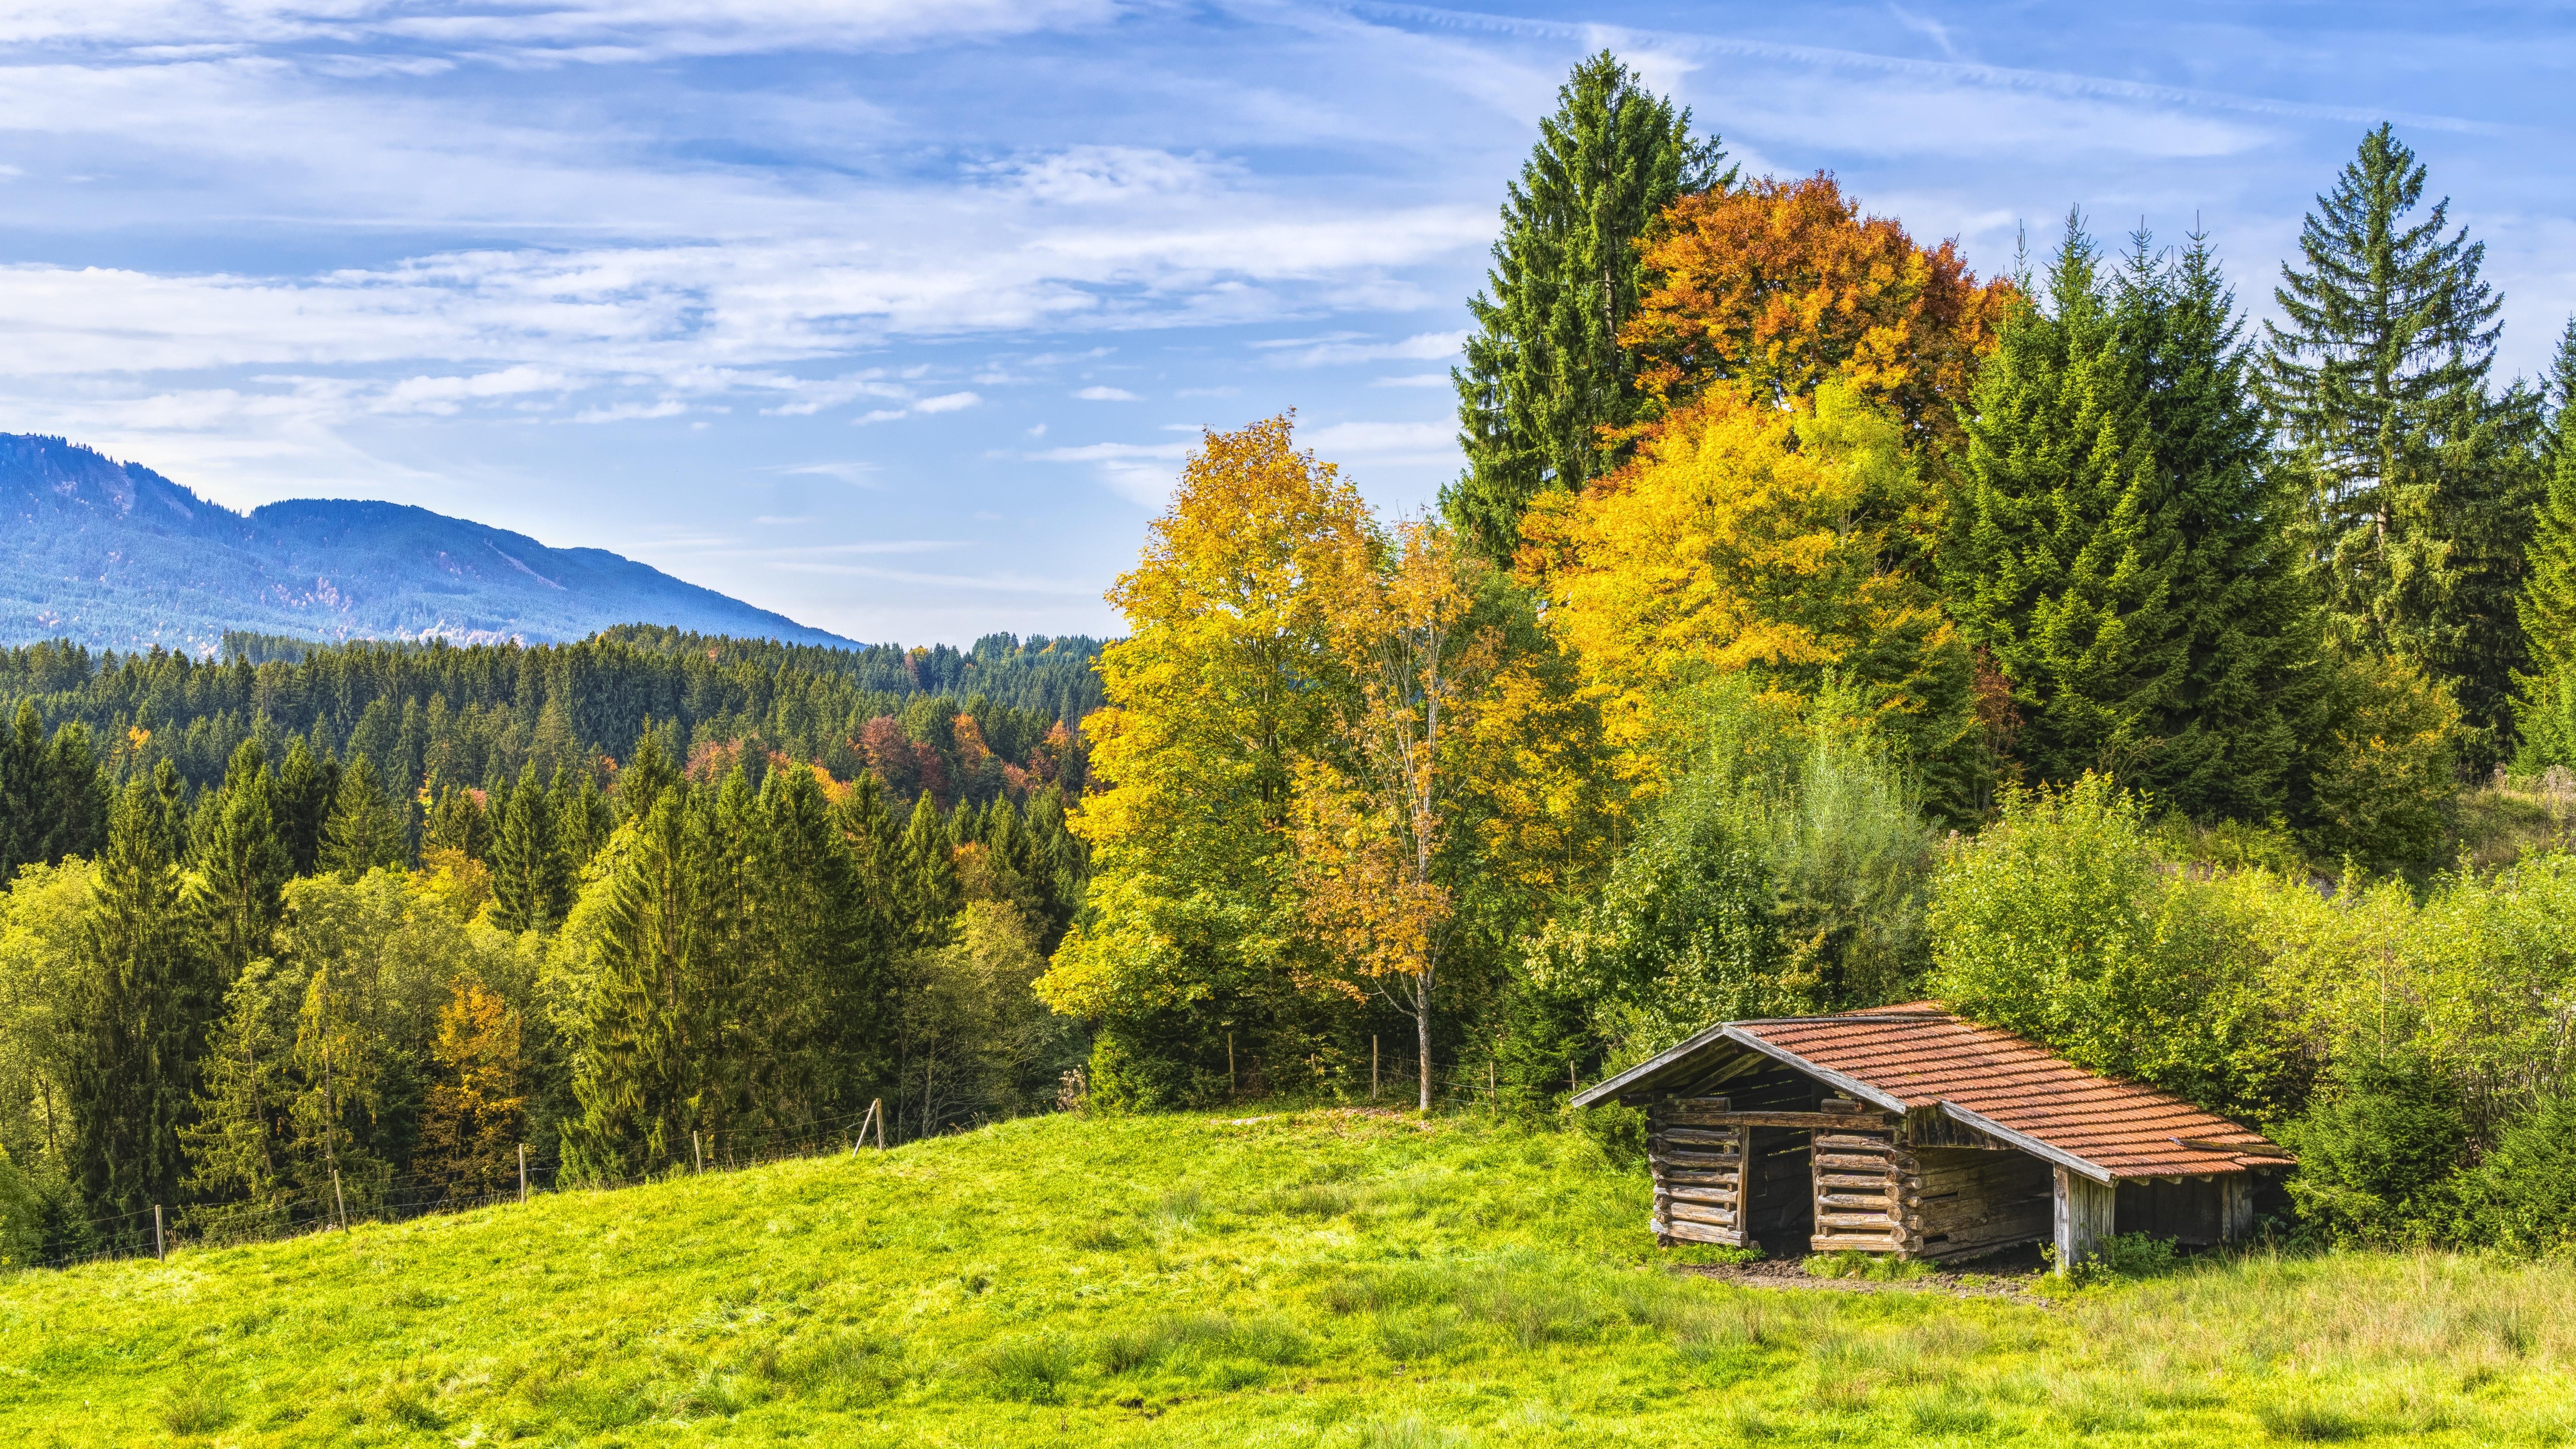 Portaria n 487/2021 institui a modalidade Floresta+Agro